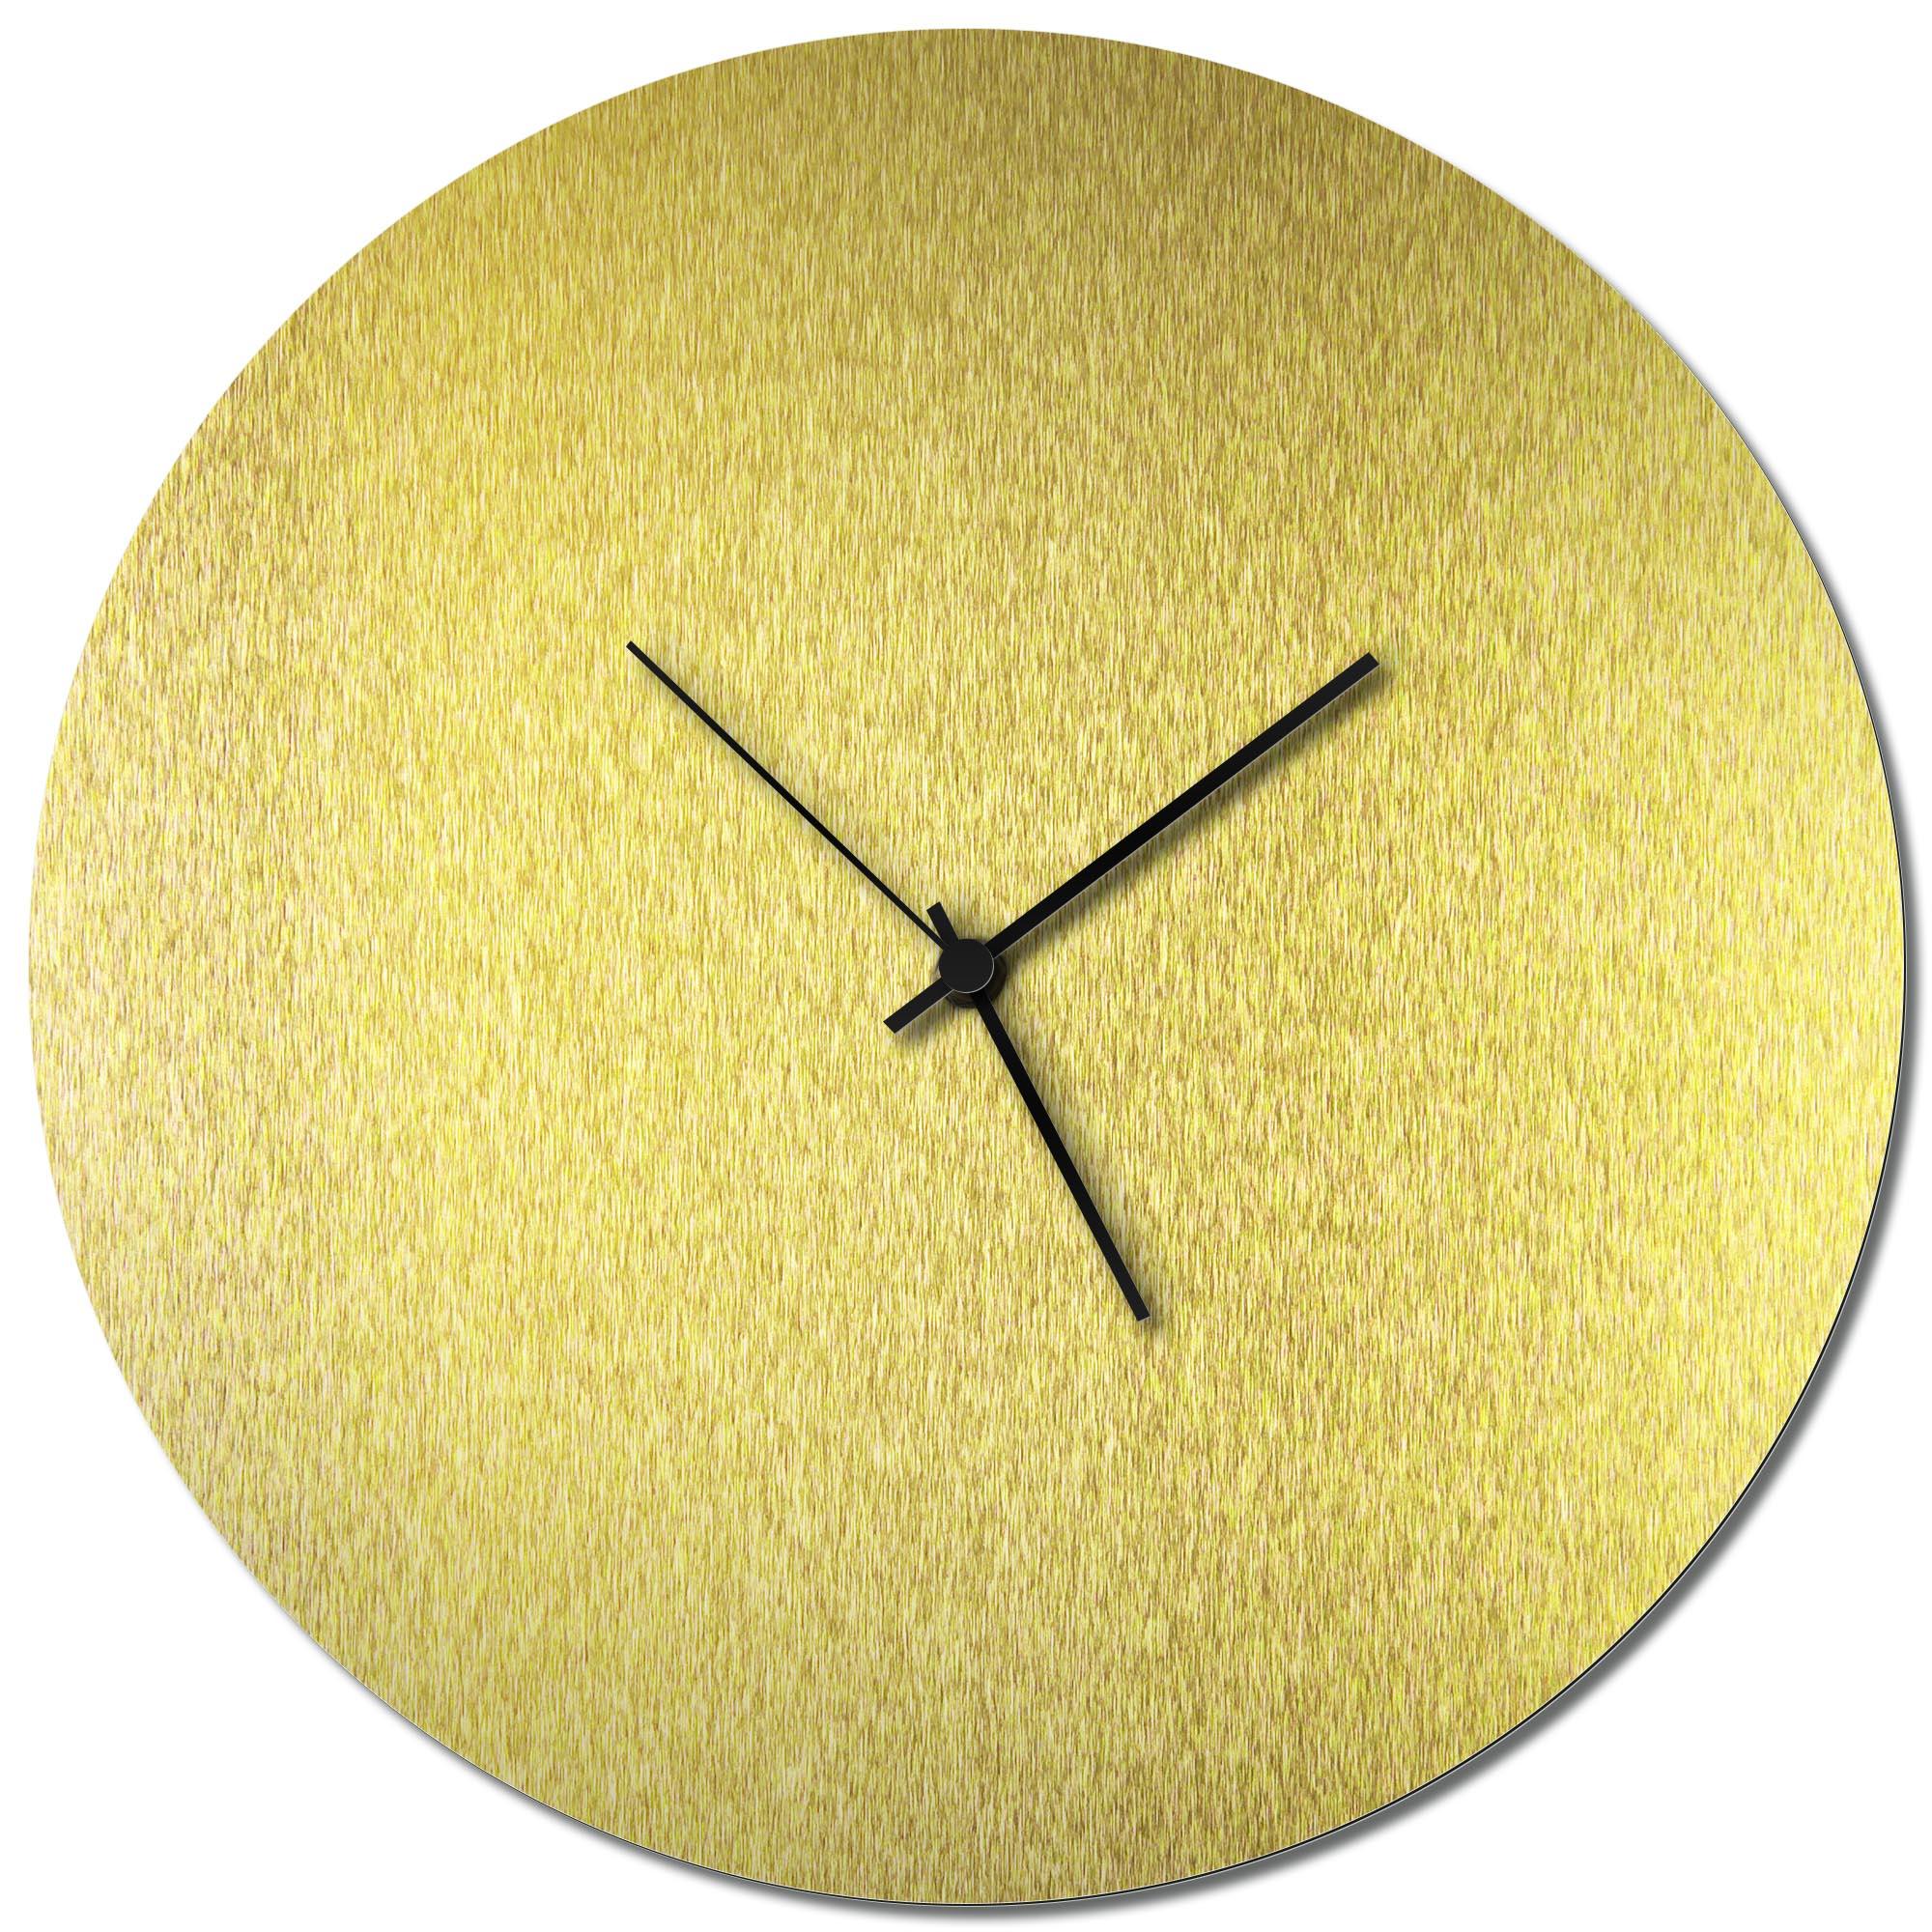 Adam Schwoeppe 'Goldsmith Circle Clock Large Black' Midcentury Modern Style Wall Clock